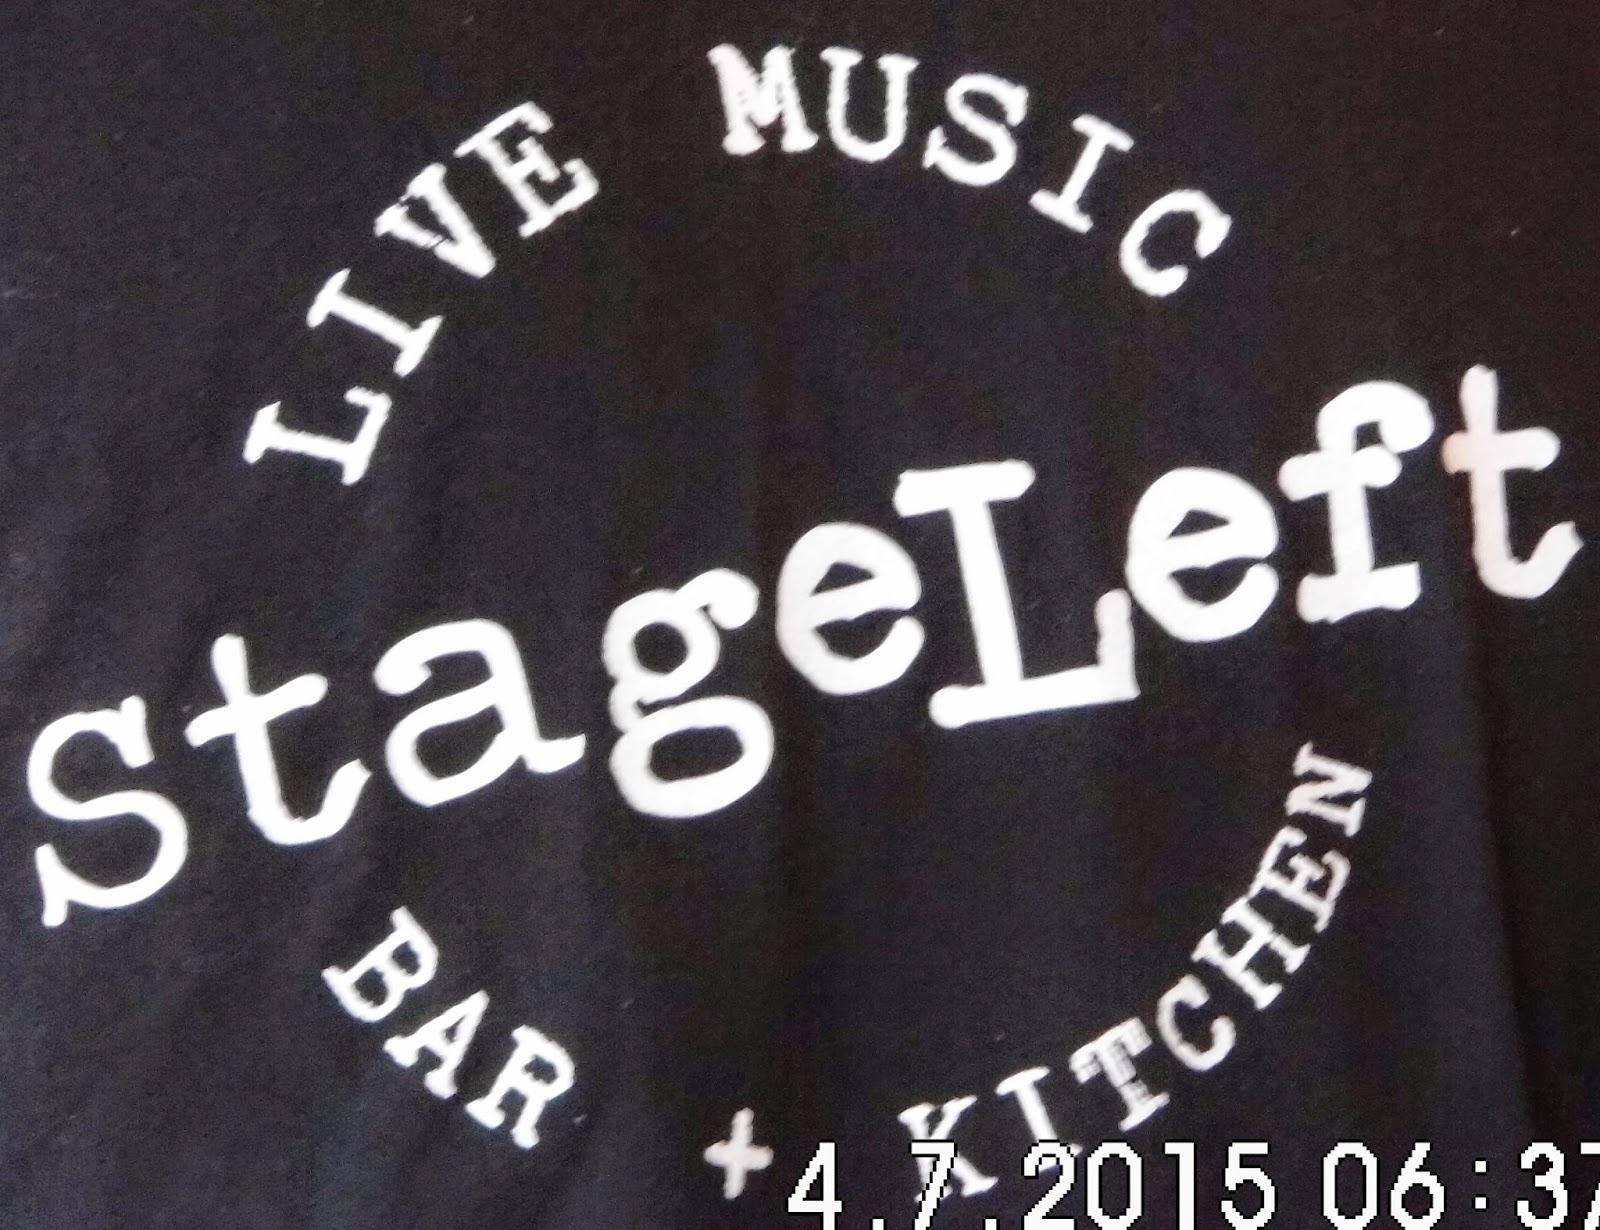 www.stagelefttampa.com